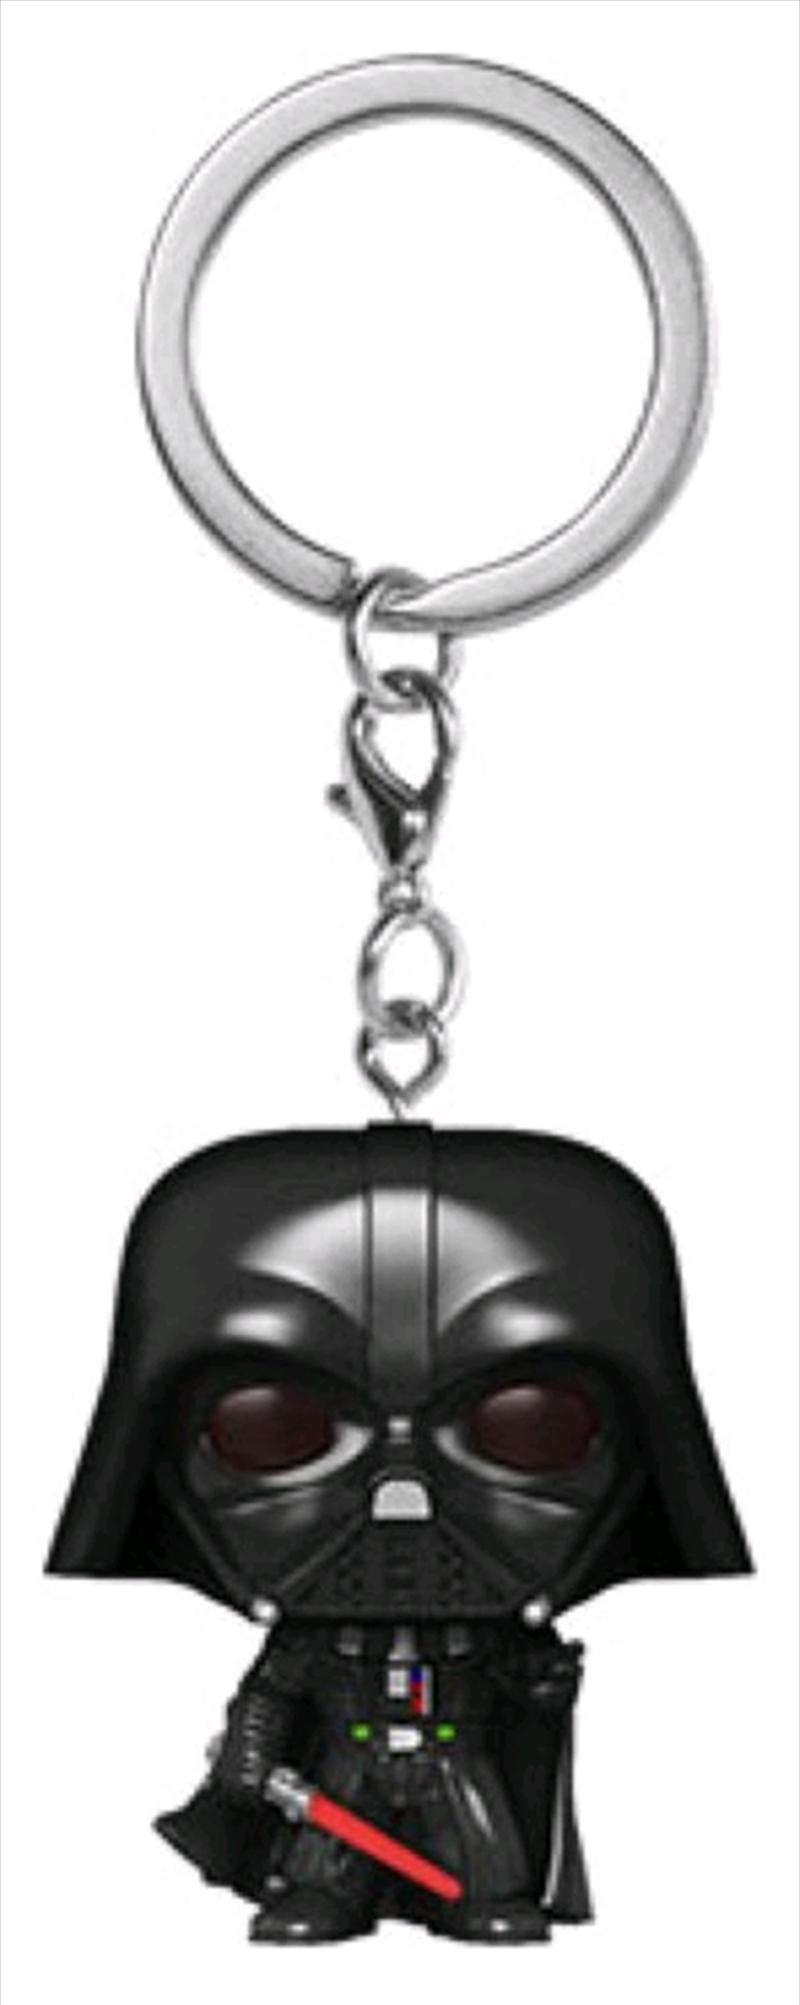 Star Wars - Darth Vader Pocket Pop! Keychain | Pop Vinyl